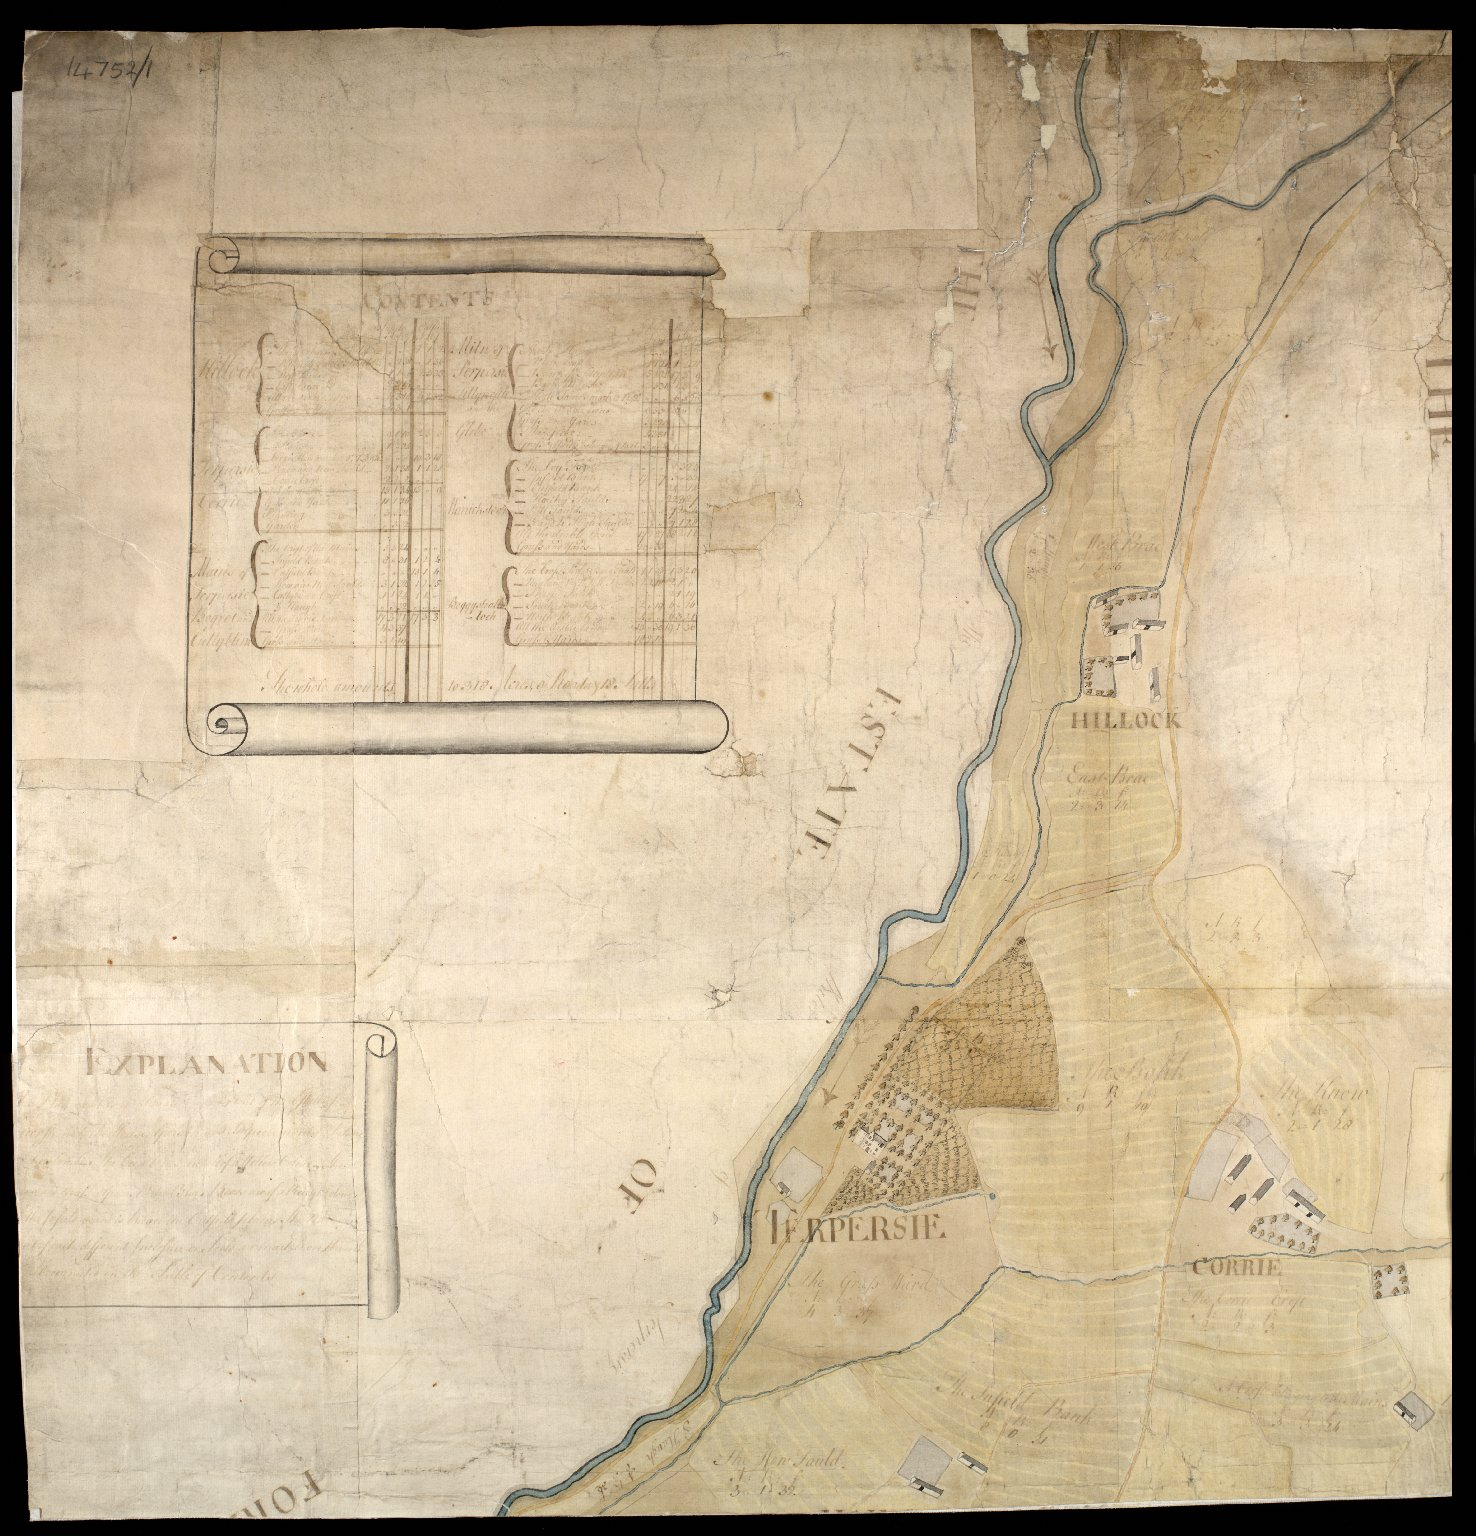 Plan of Estate Terpersie Belonging to James Gordon of Moorplace [1 of 4]